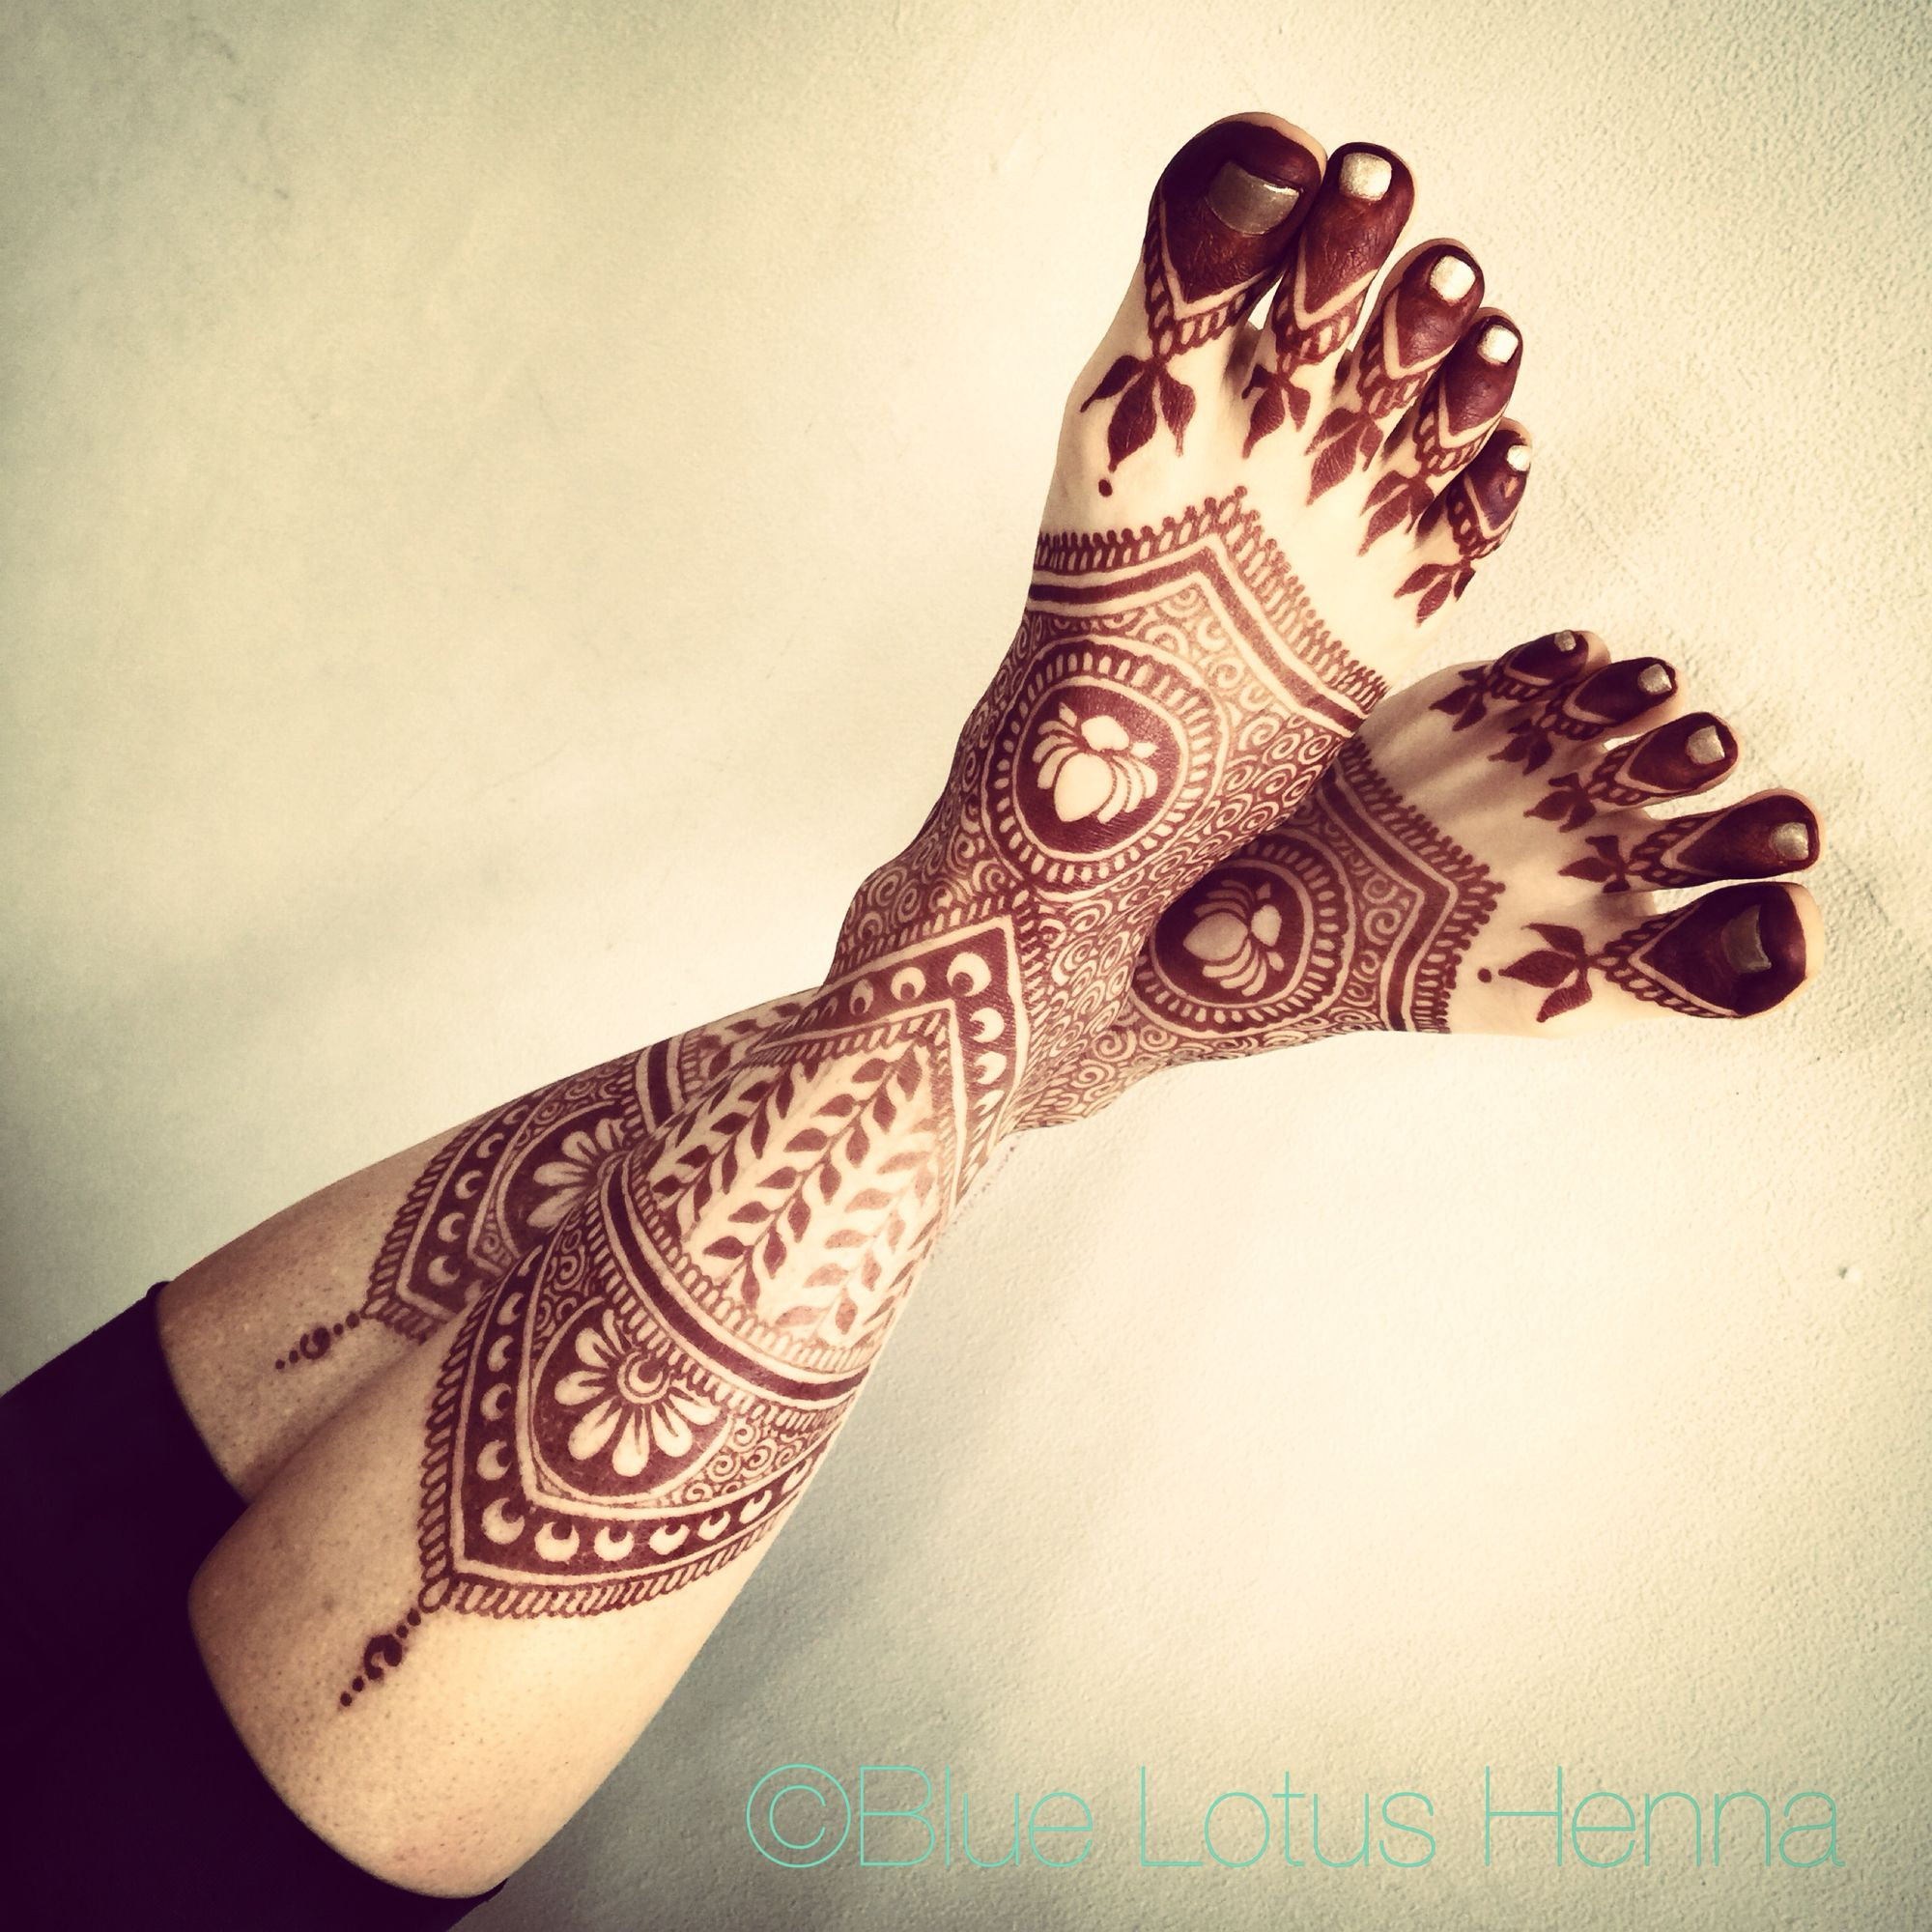 Blue Henna Tattoo: Feet Casually Up The Wall...by Blue Lotus Henna.